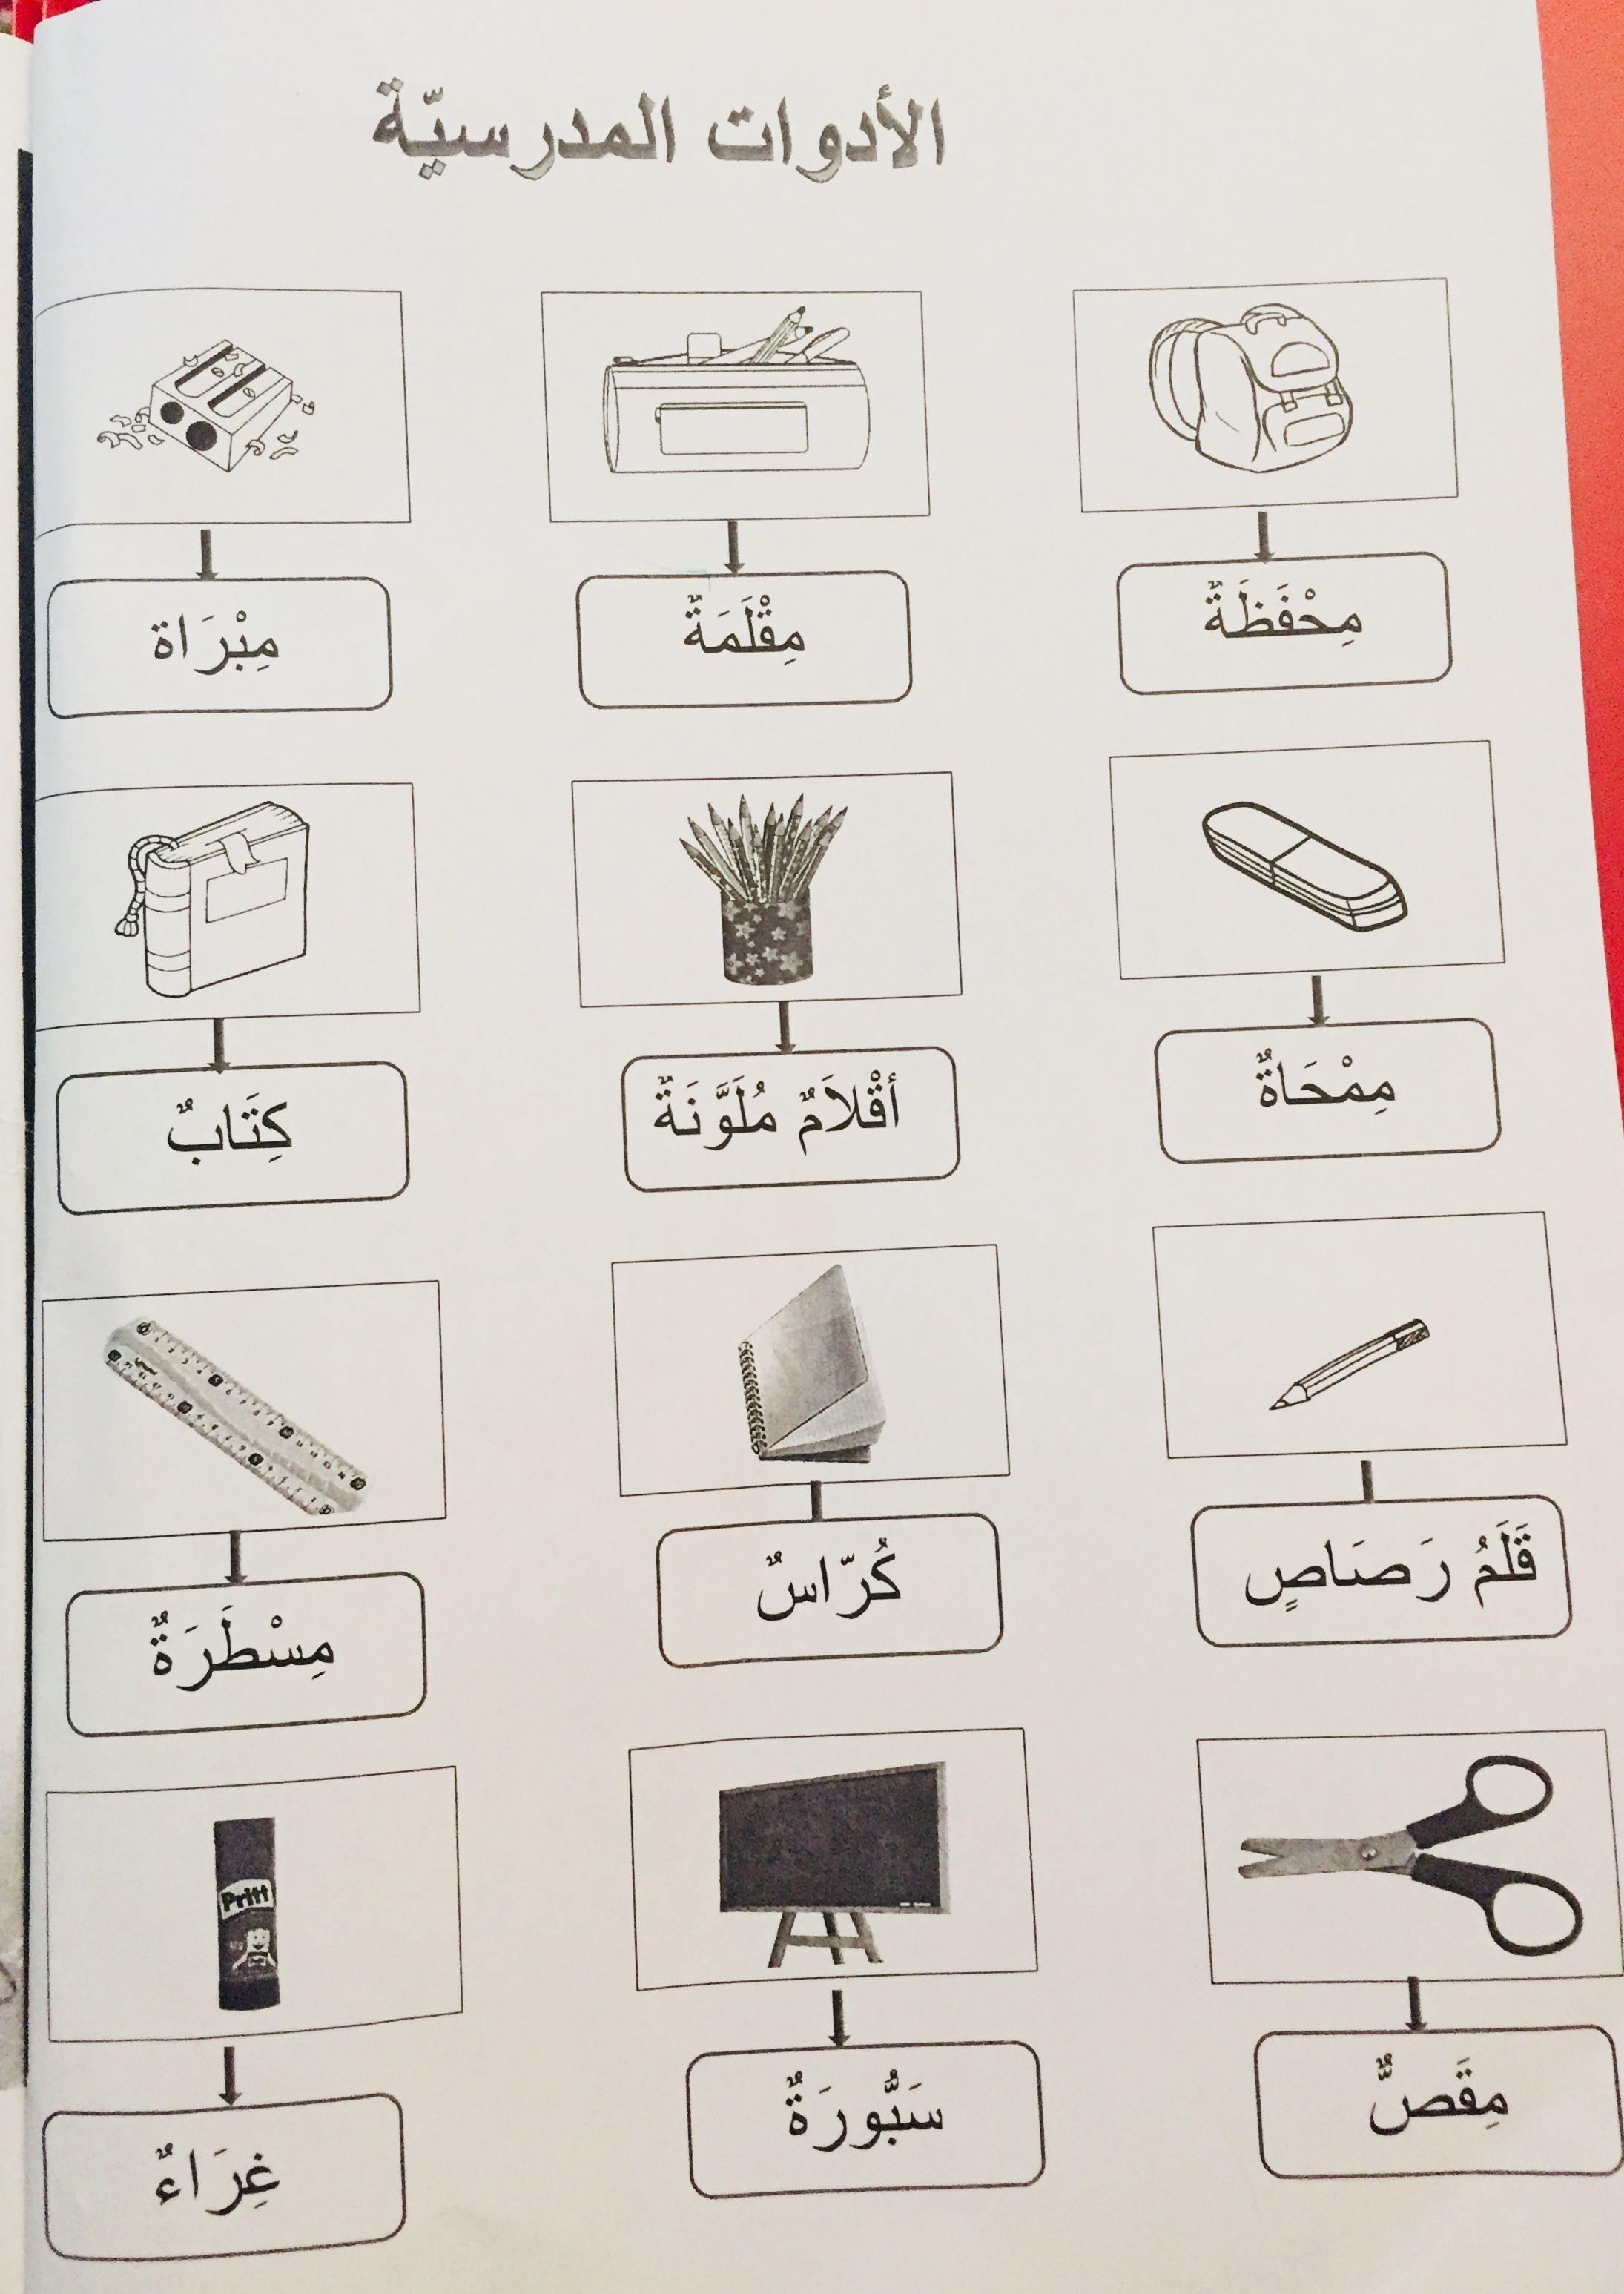 School Supplies School Tools ال أد و ات الم د ر س ي ة م ب ر اة Sharpener م ق ل م ة Pencil Case Bag Learning Arabic Learn Arabic Language Arabic Language